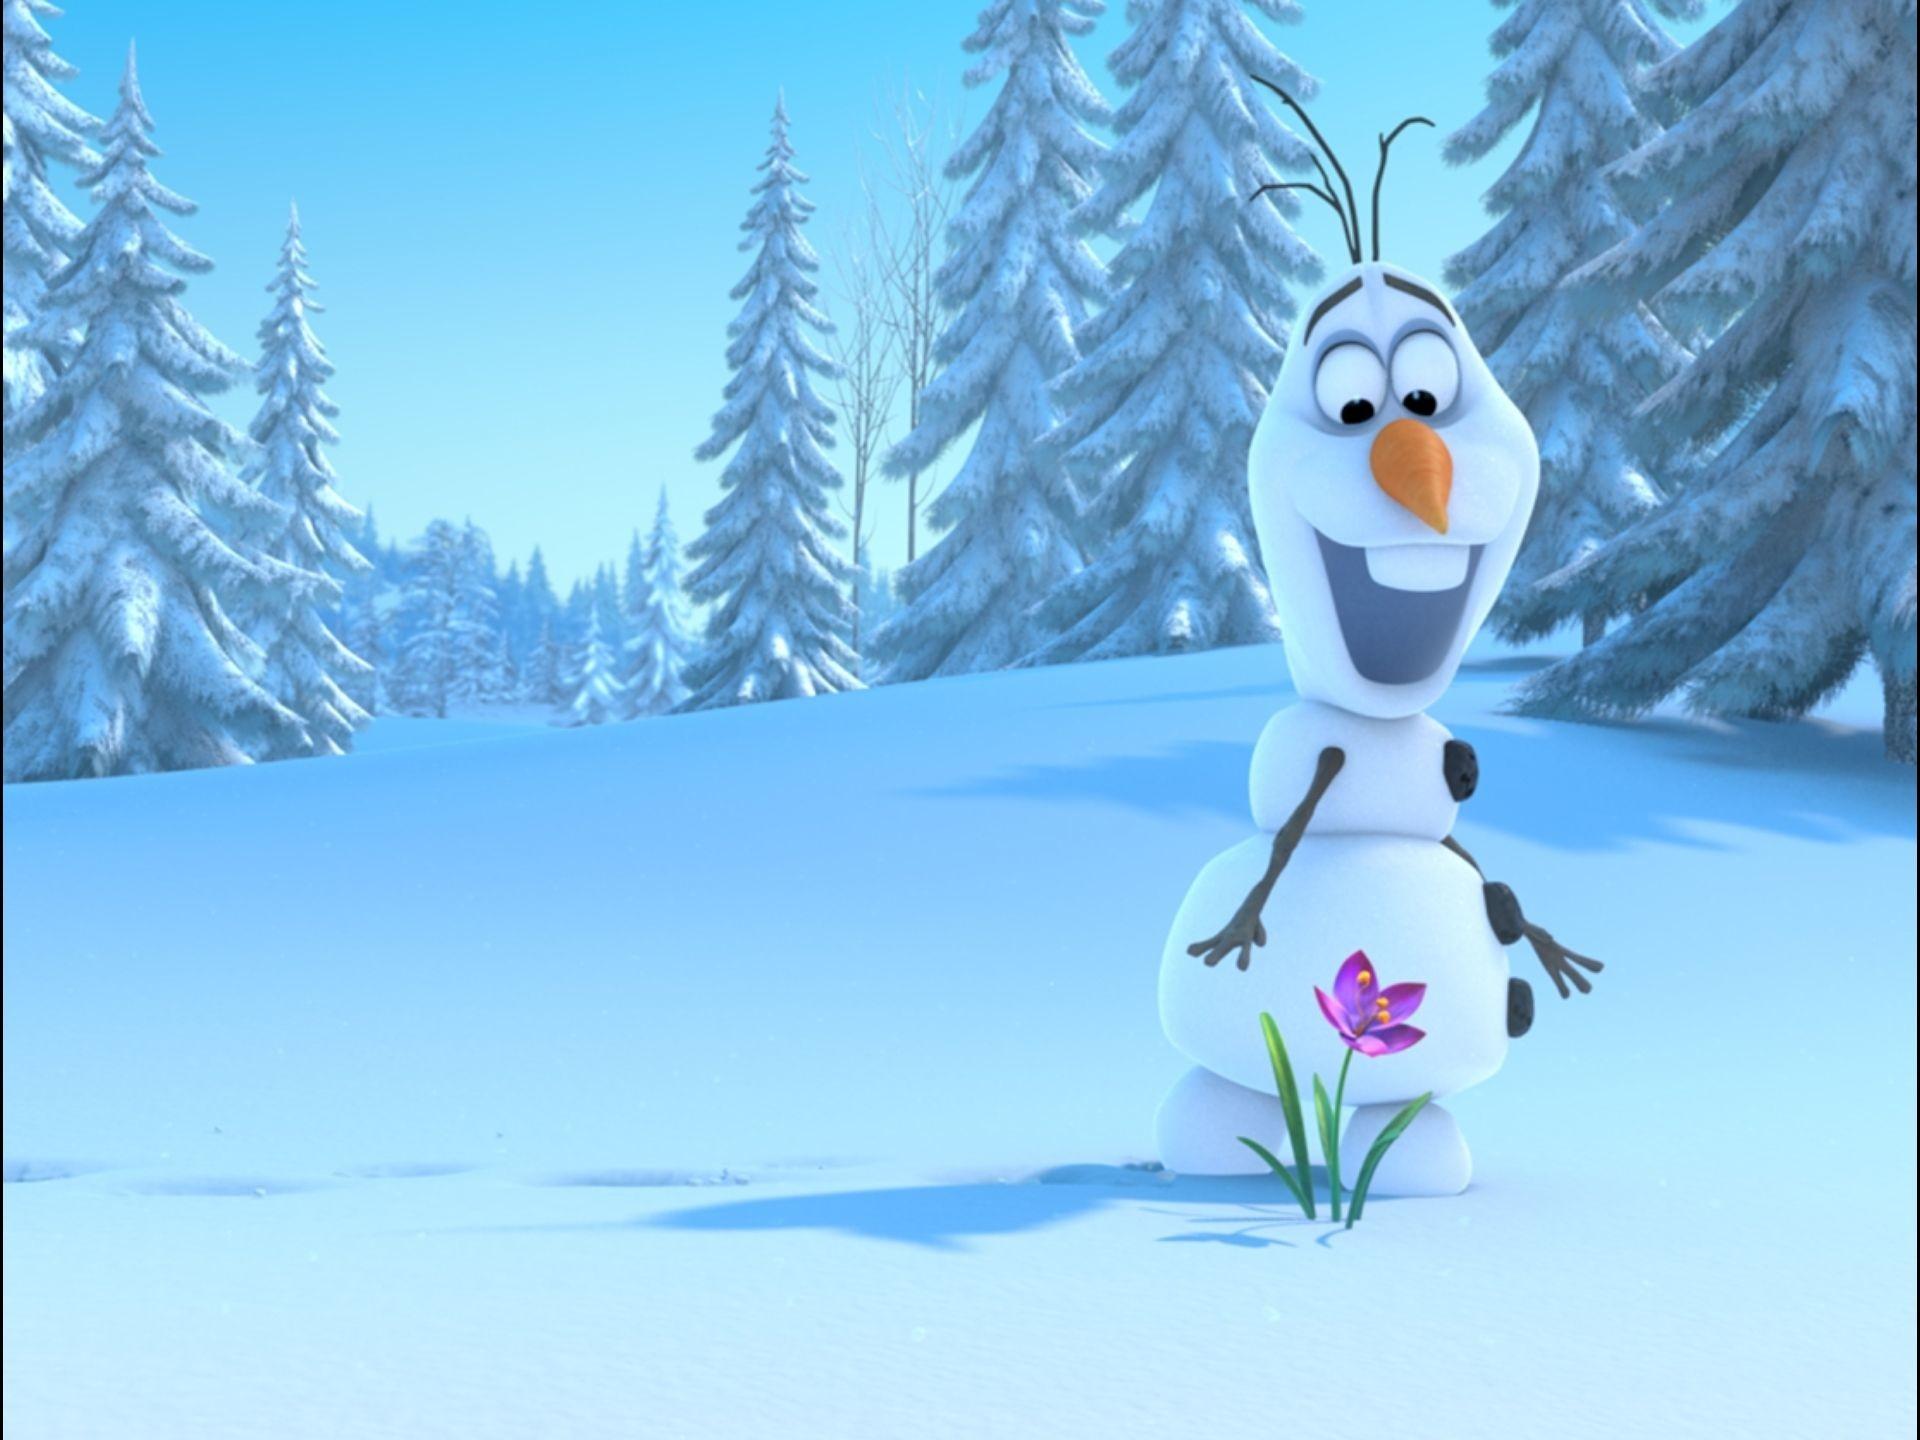 Res: 1920x1440, Disney Frozen Olaf